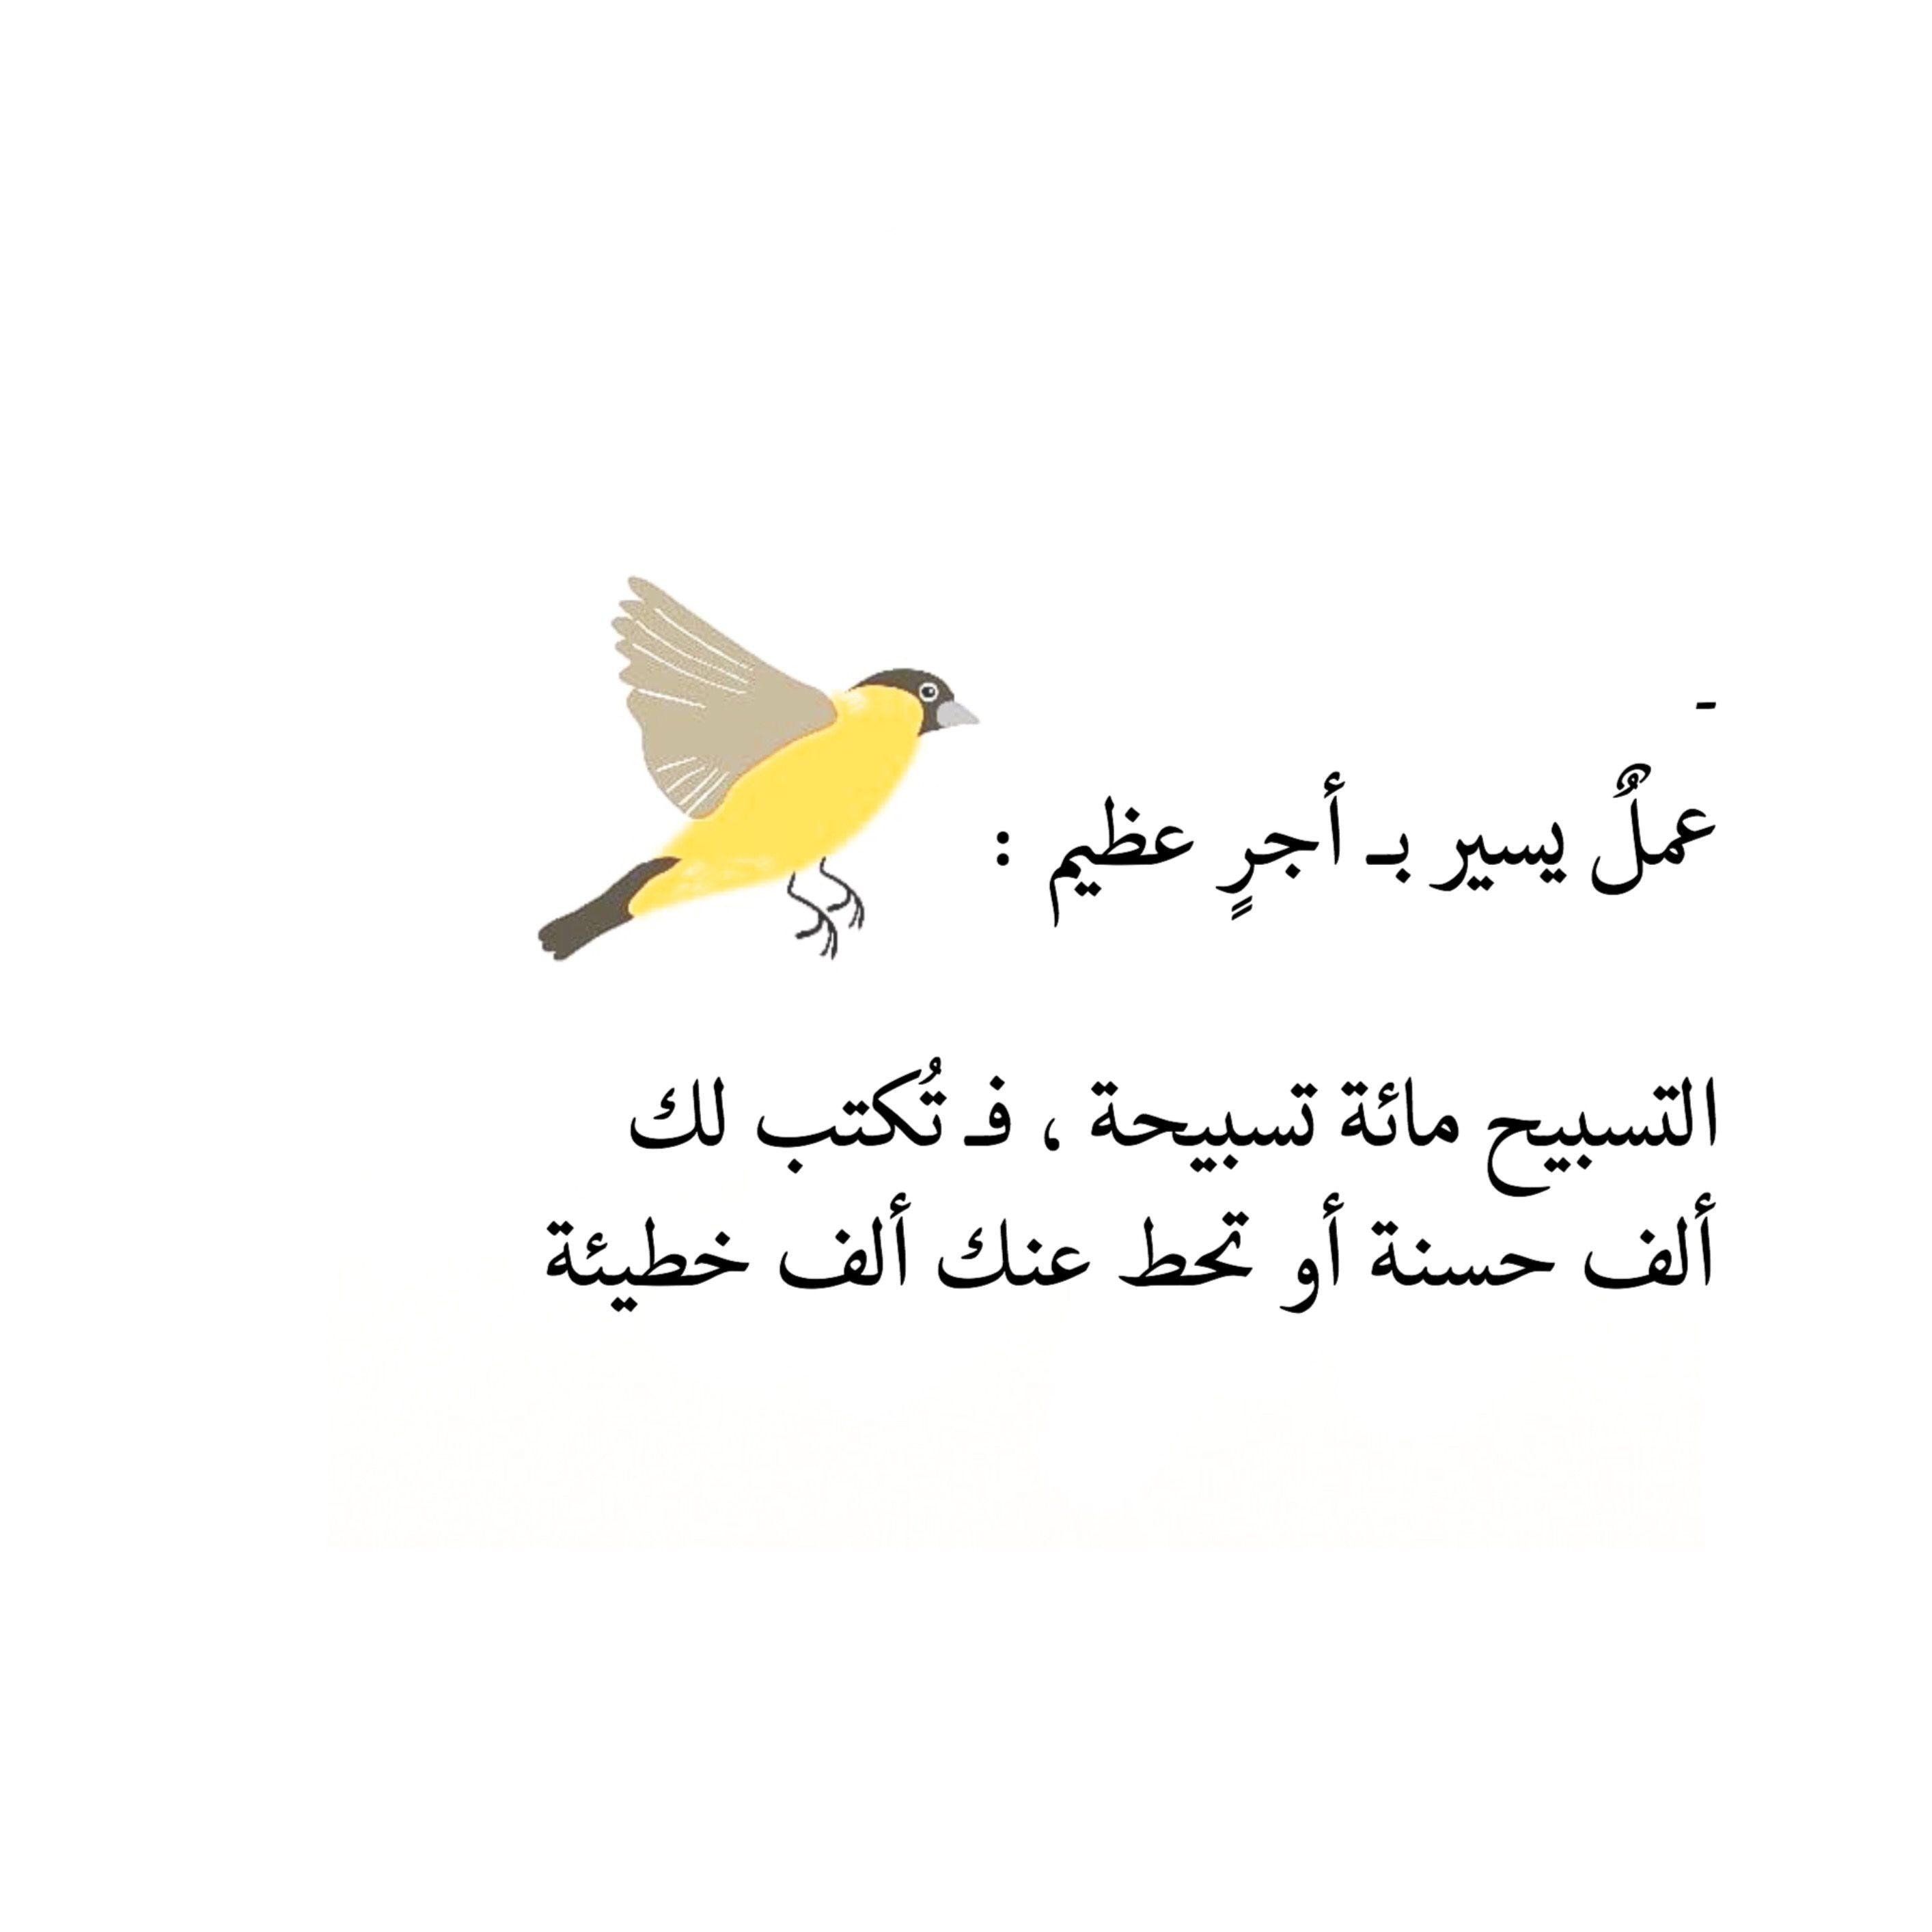 سبحان الله سبحان الله Positive Quotes Talking Quotes Islamic Quotes